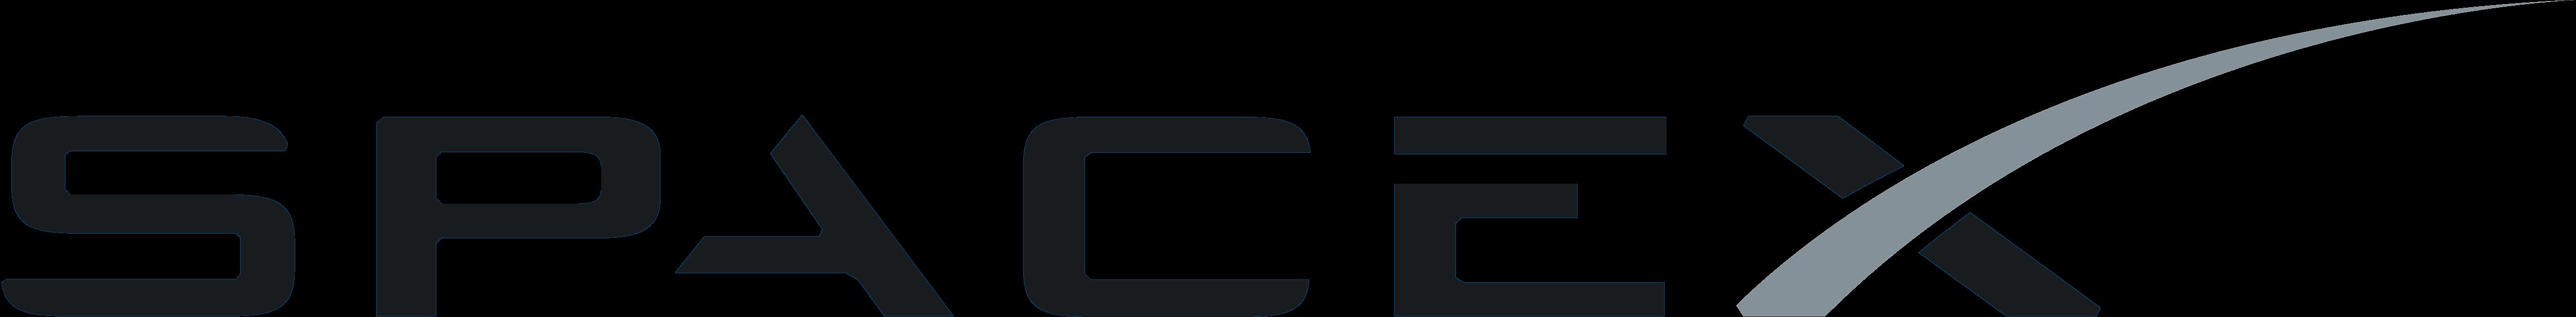 SpaceX – Logos Download